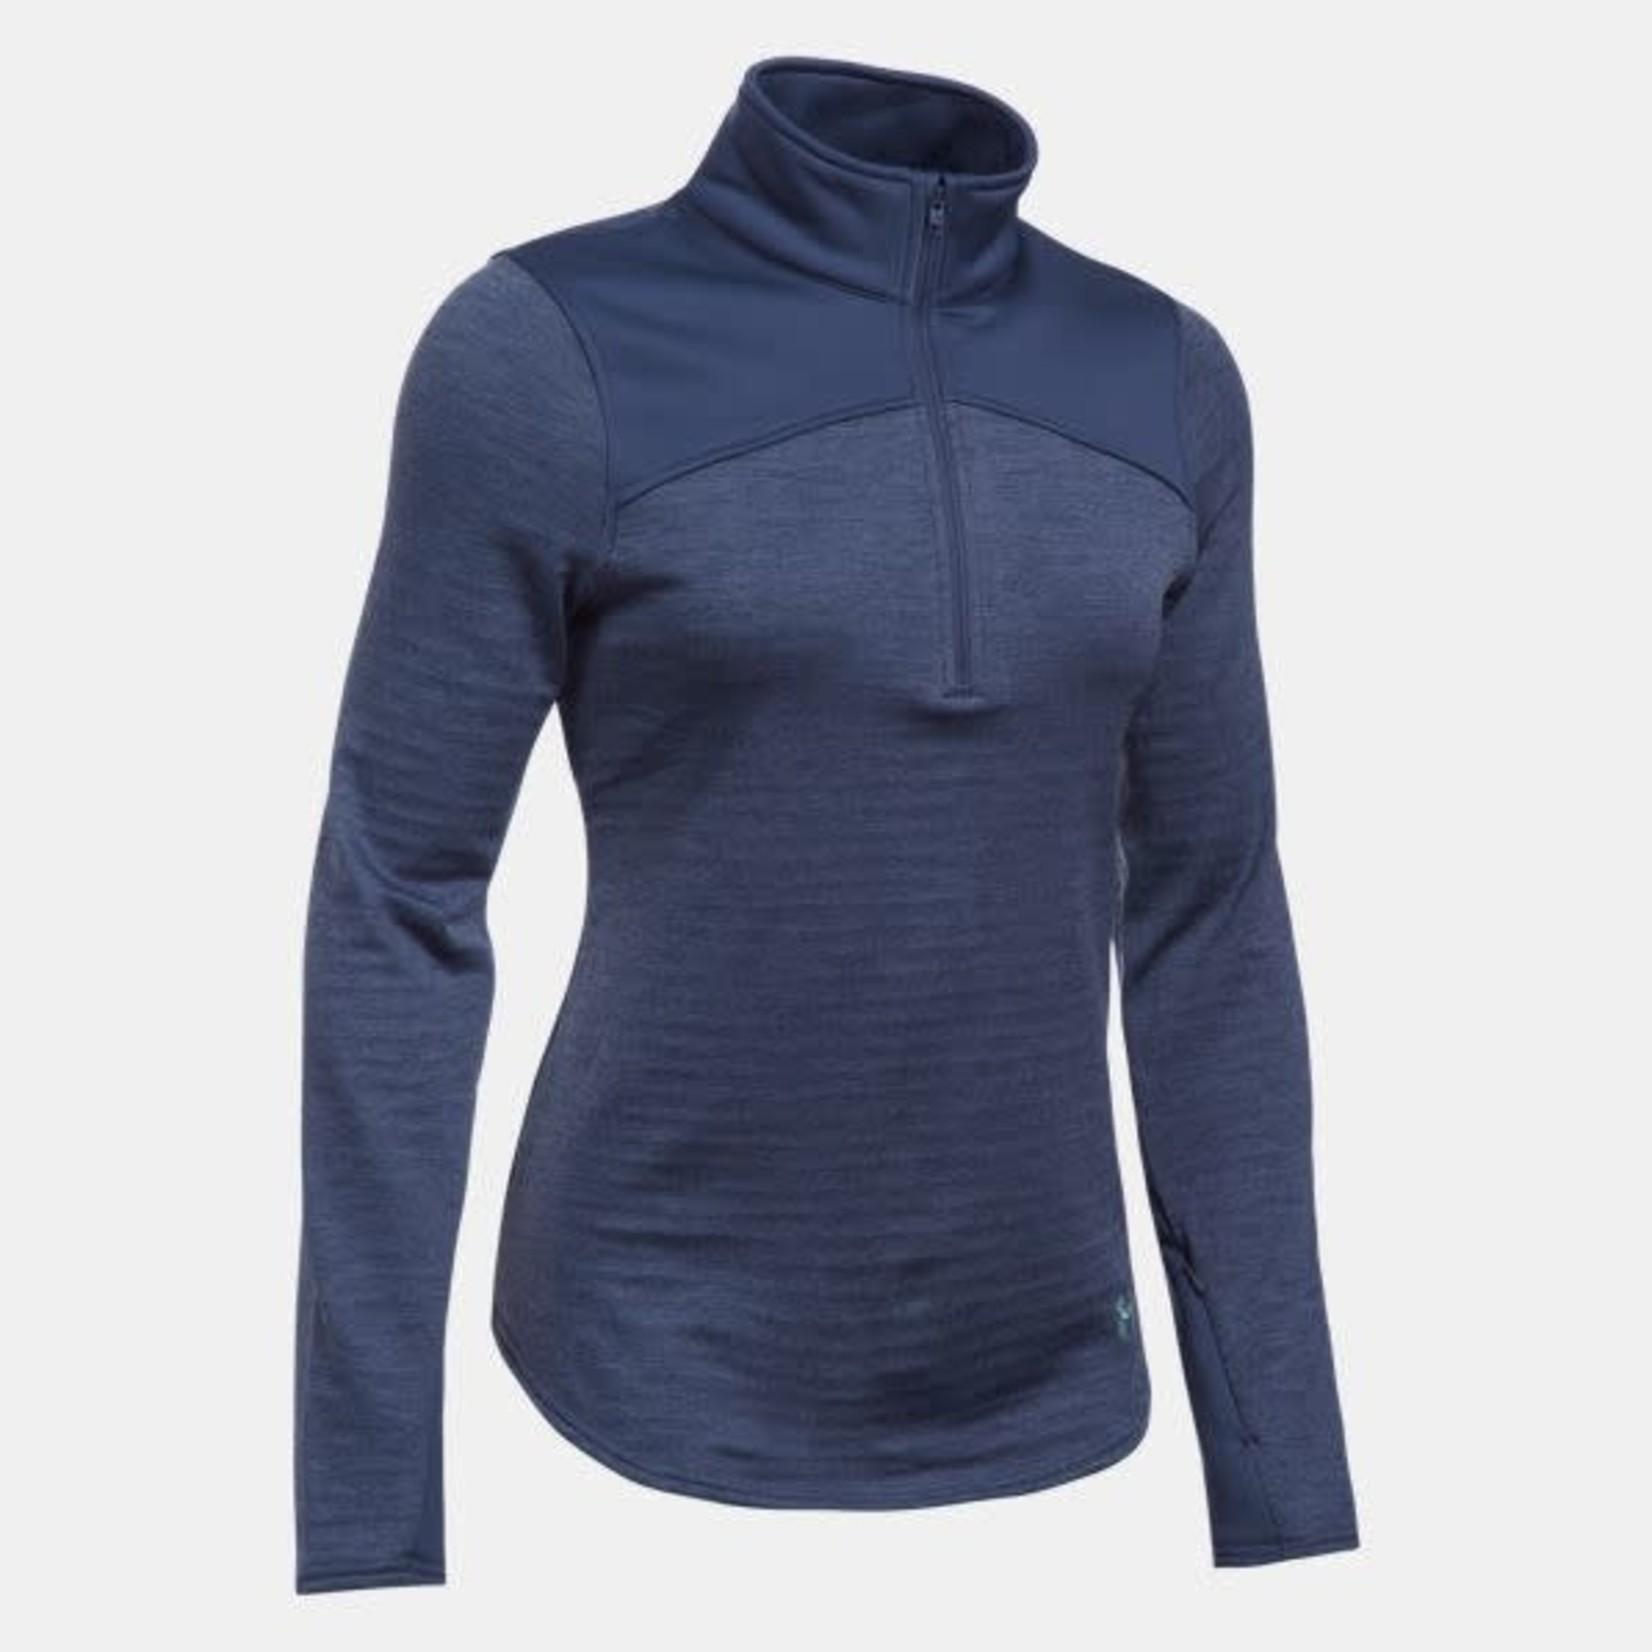 UA 1259525 LAD ColdGear 1/4 Zip Pullover Blue Large